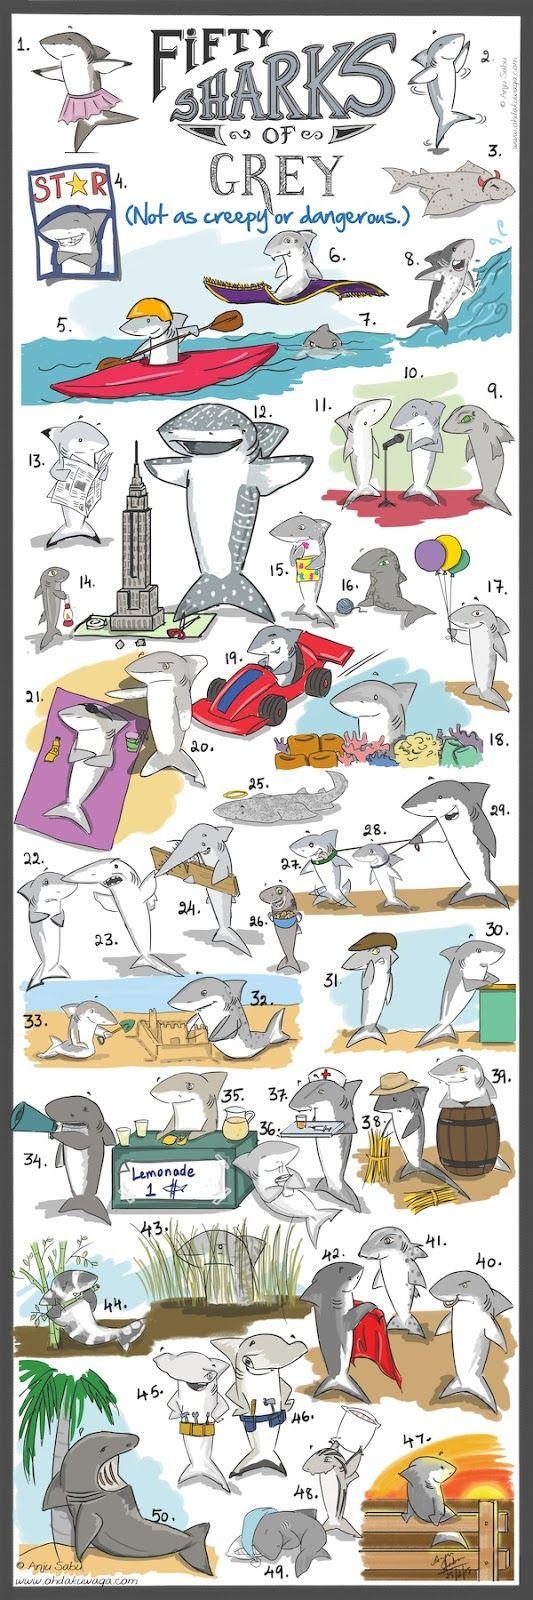 """Oh, Dakuwaqa!"" - The Shark comics and cartoons: Fifty Sharks of Grey"